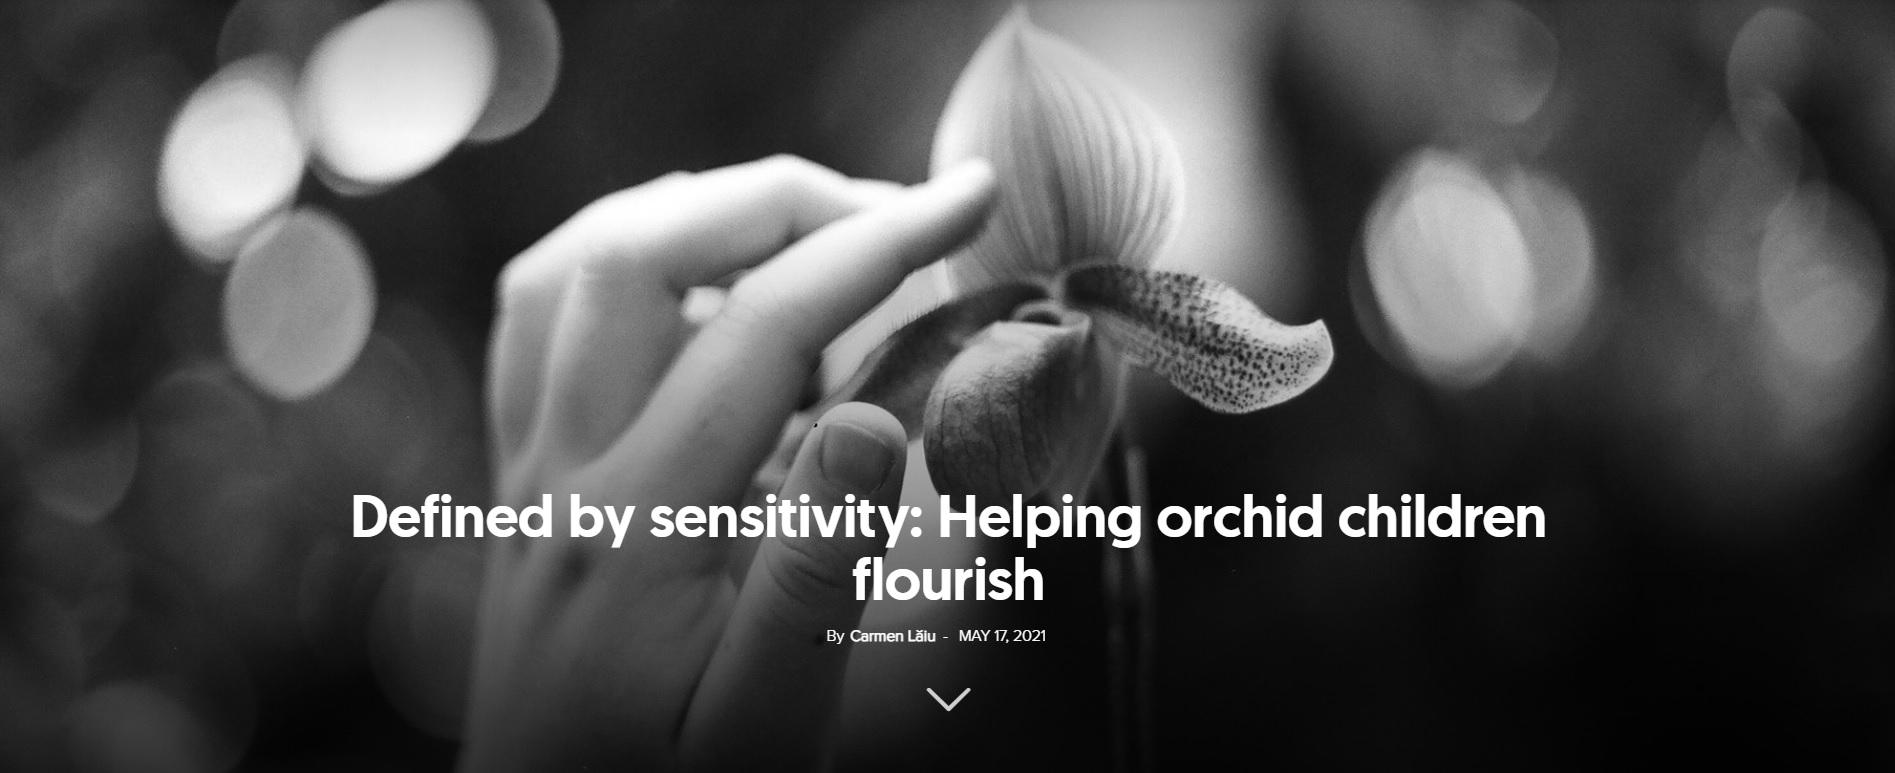 Defined by sensitivity